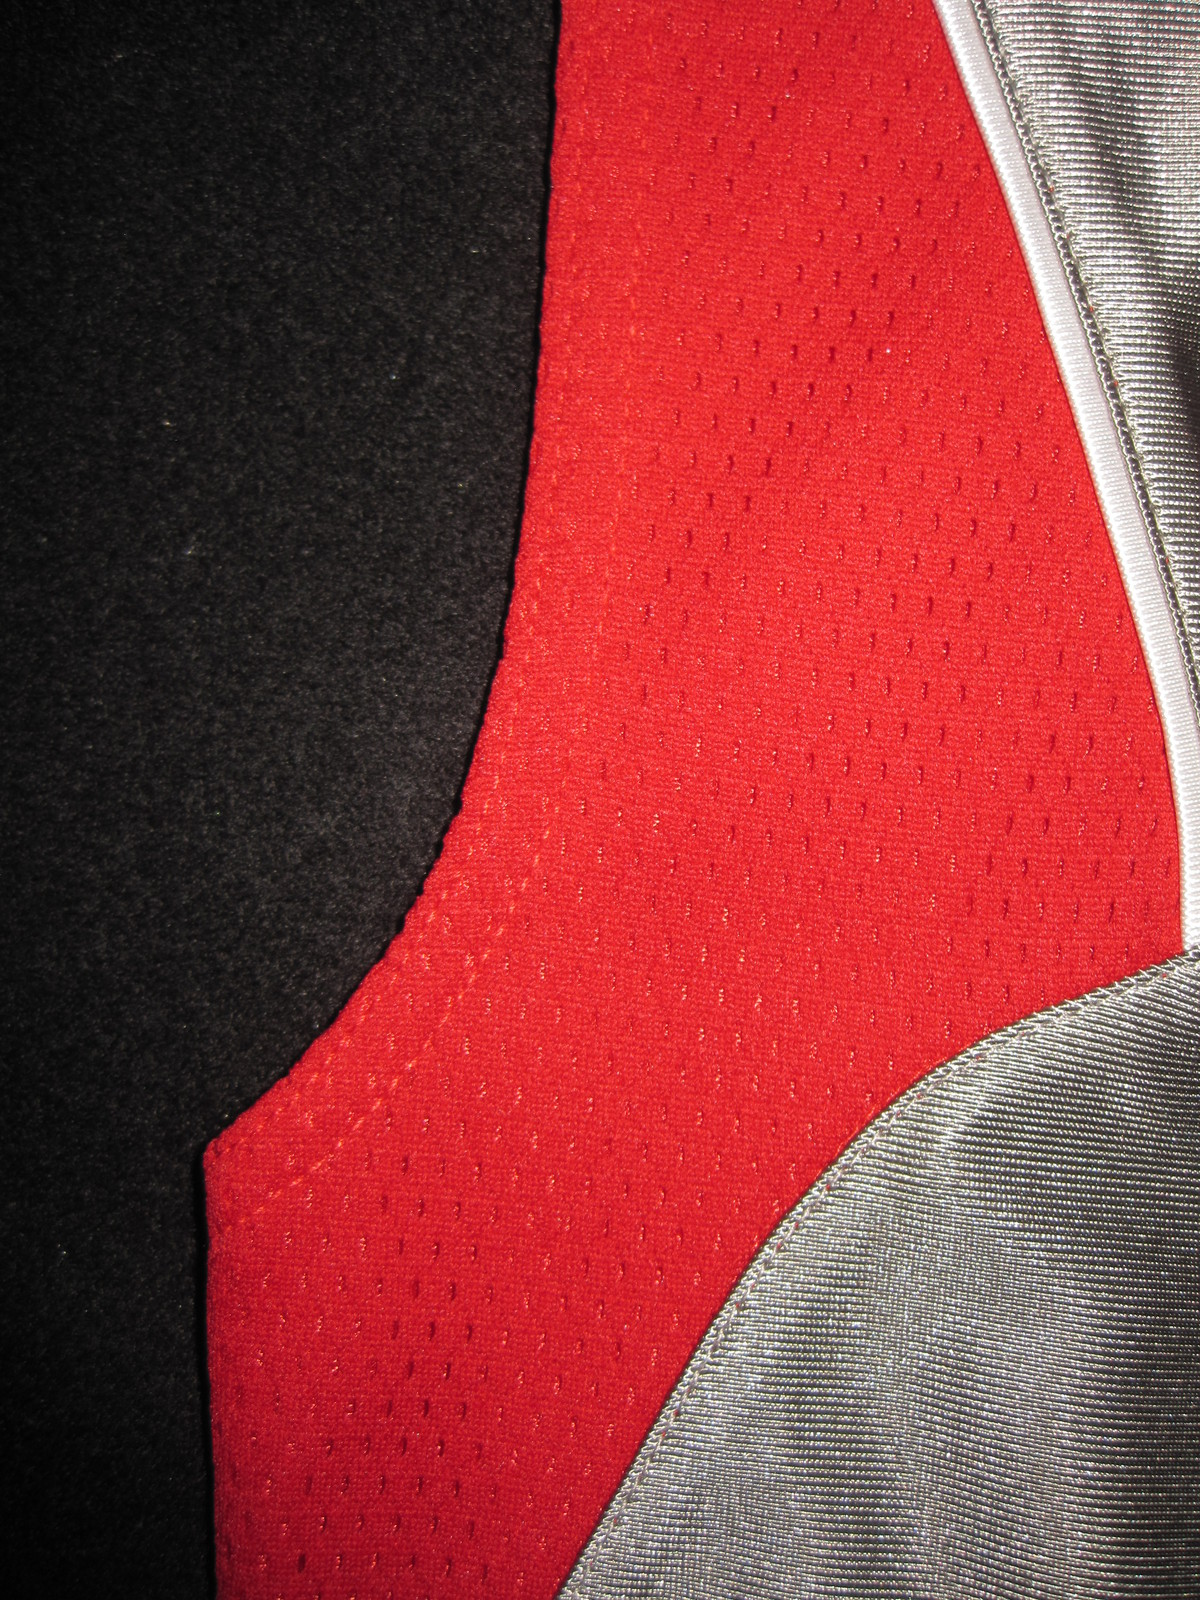 BOYS 6 - Nike - Flight Grey-Red-White BASKETBALL SPORTS JERSEY image 7